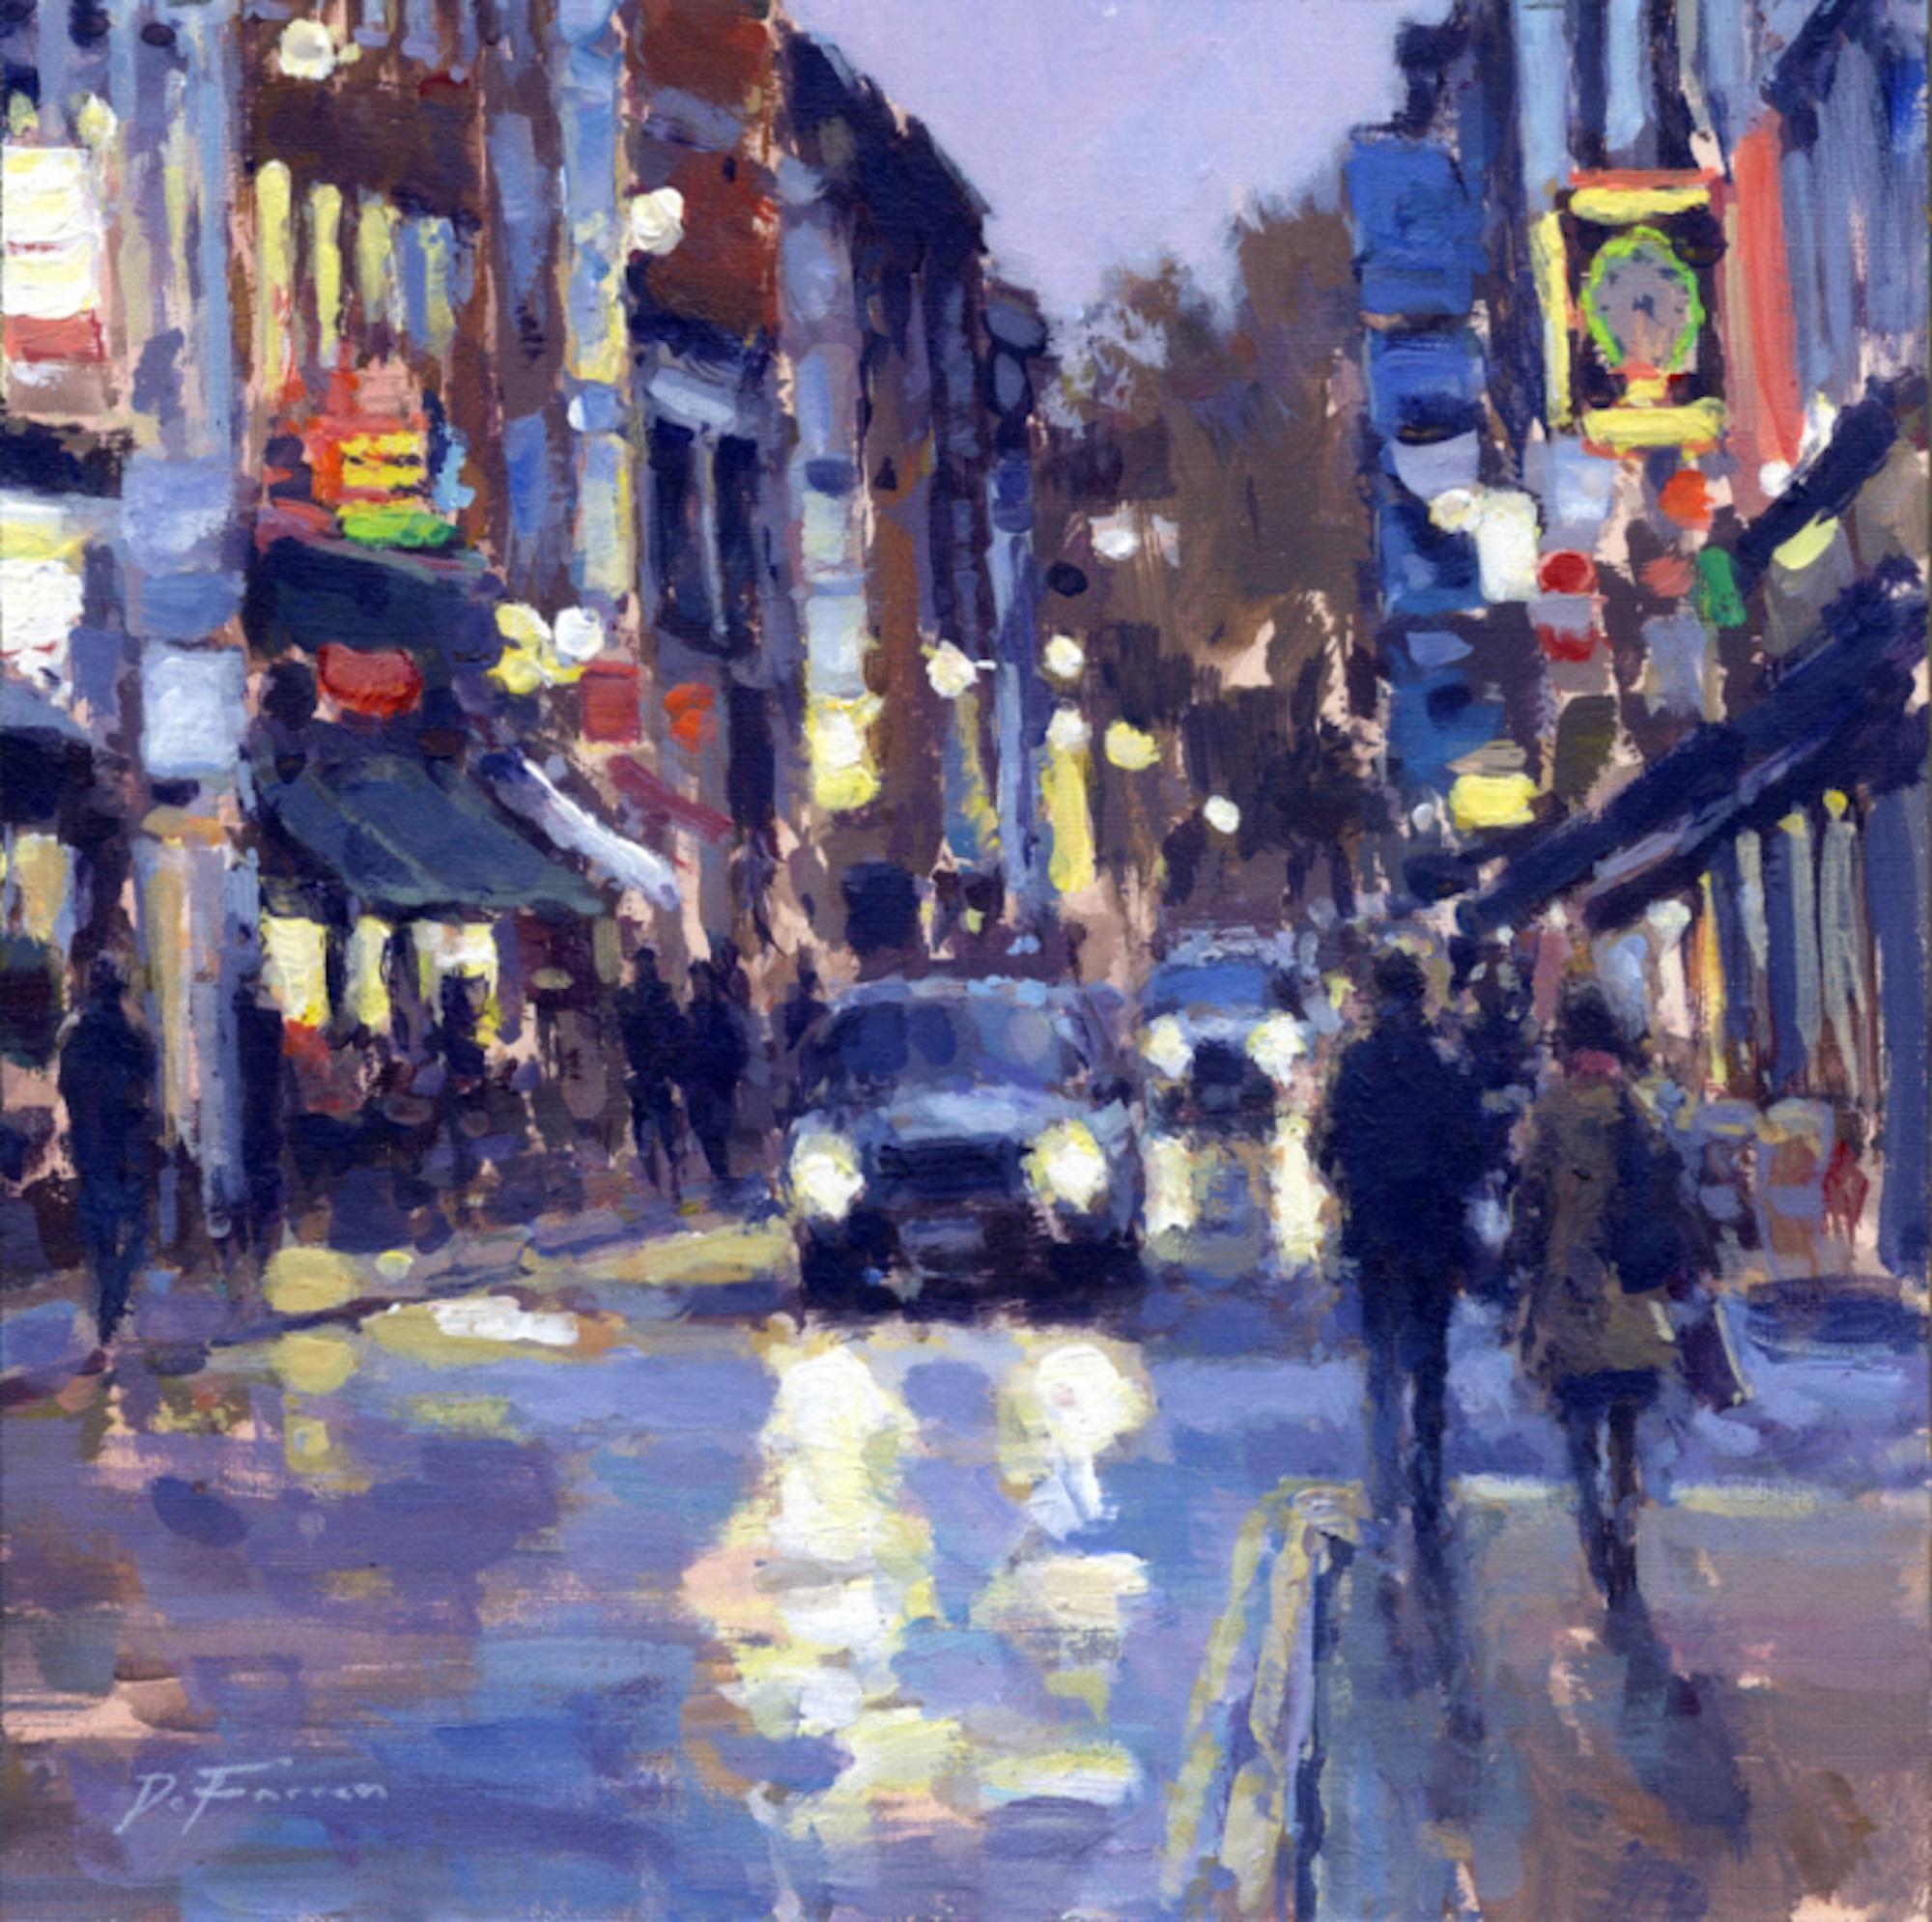 Friday Night, Frith Street, Soho - England City England artwork Contemporary